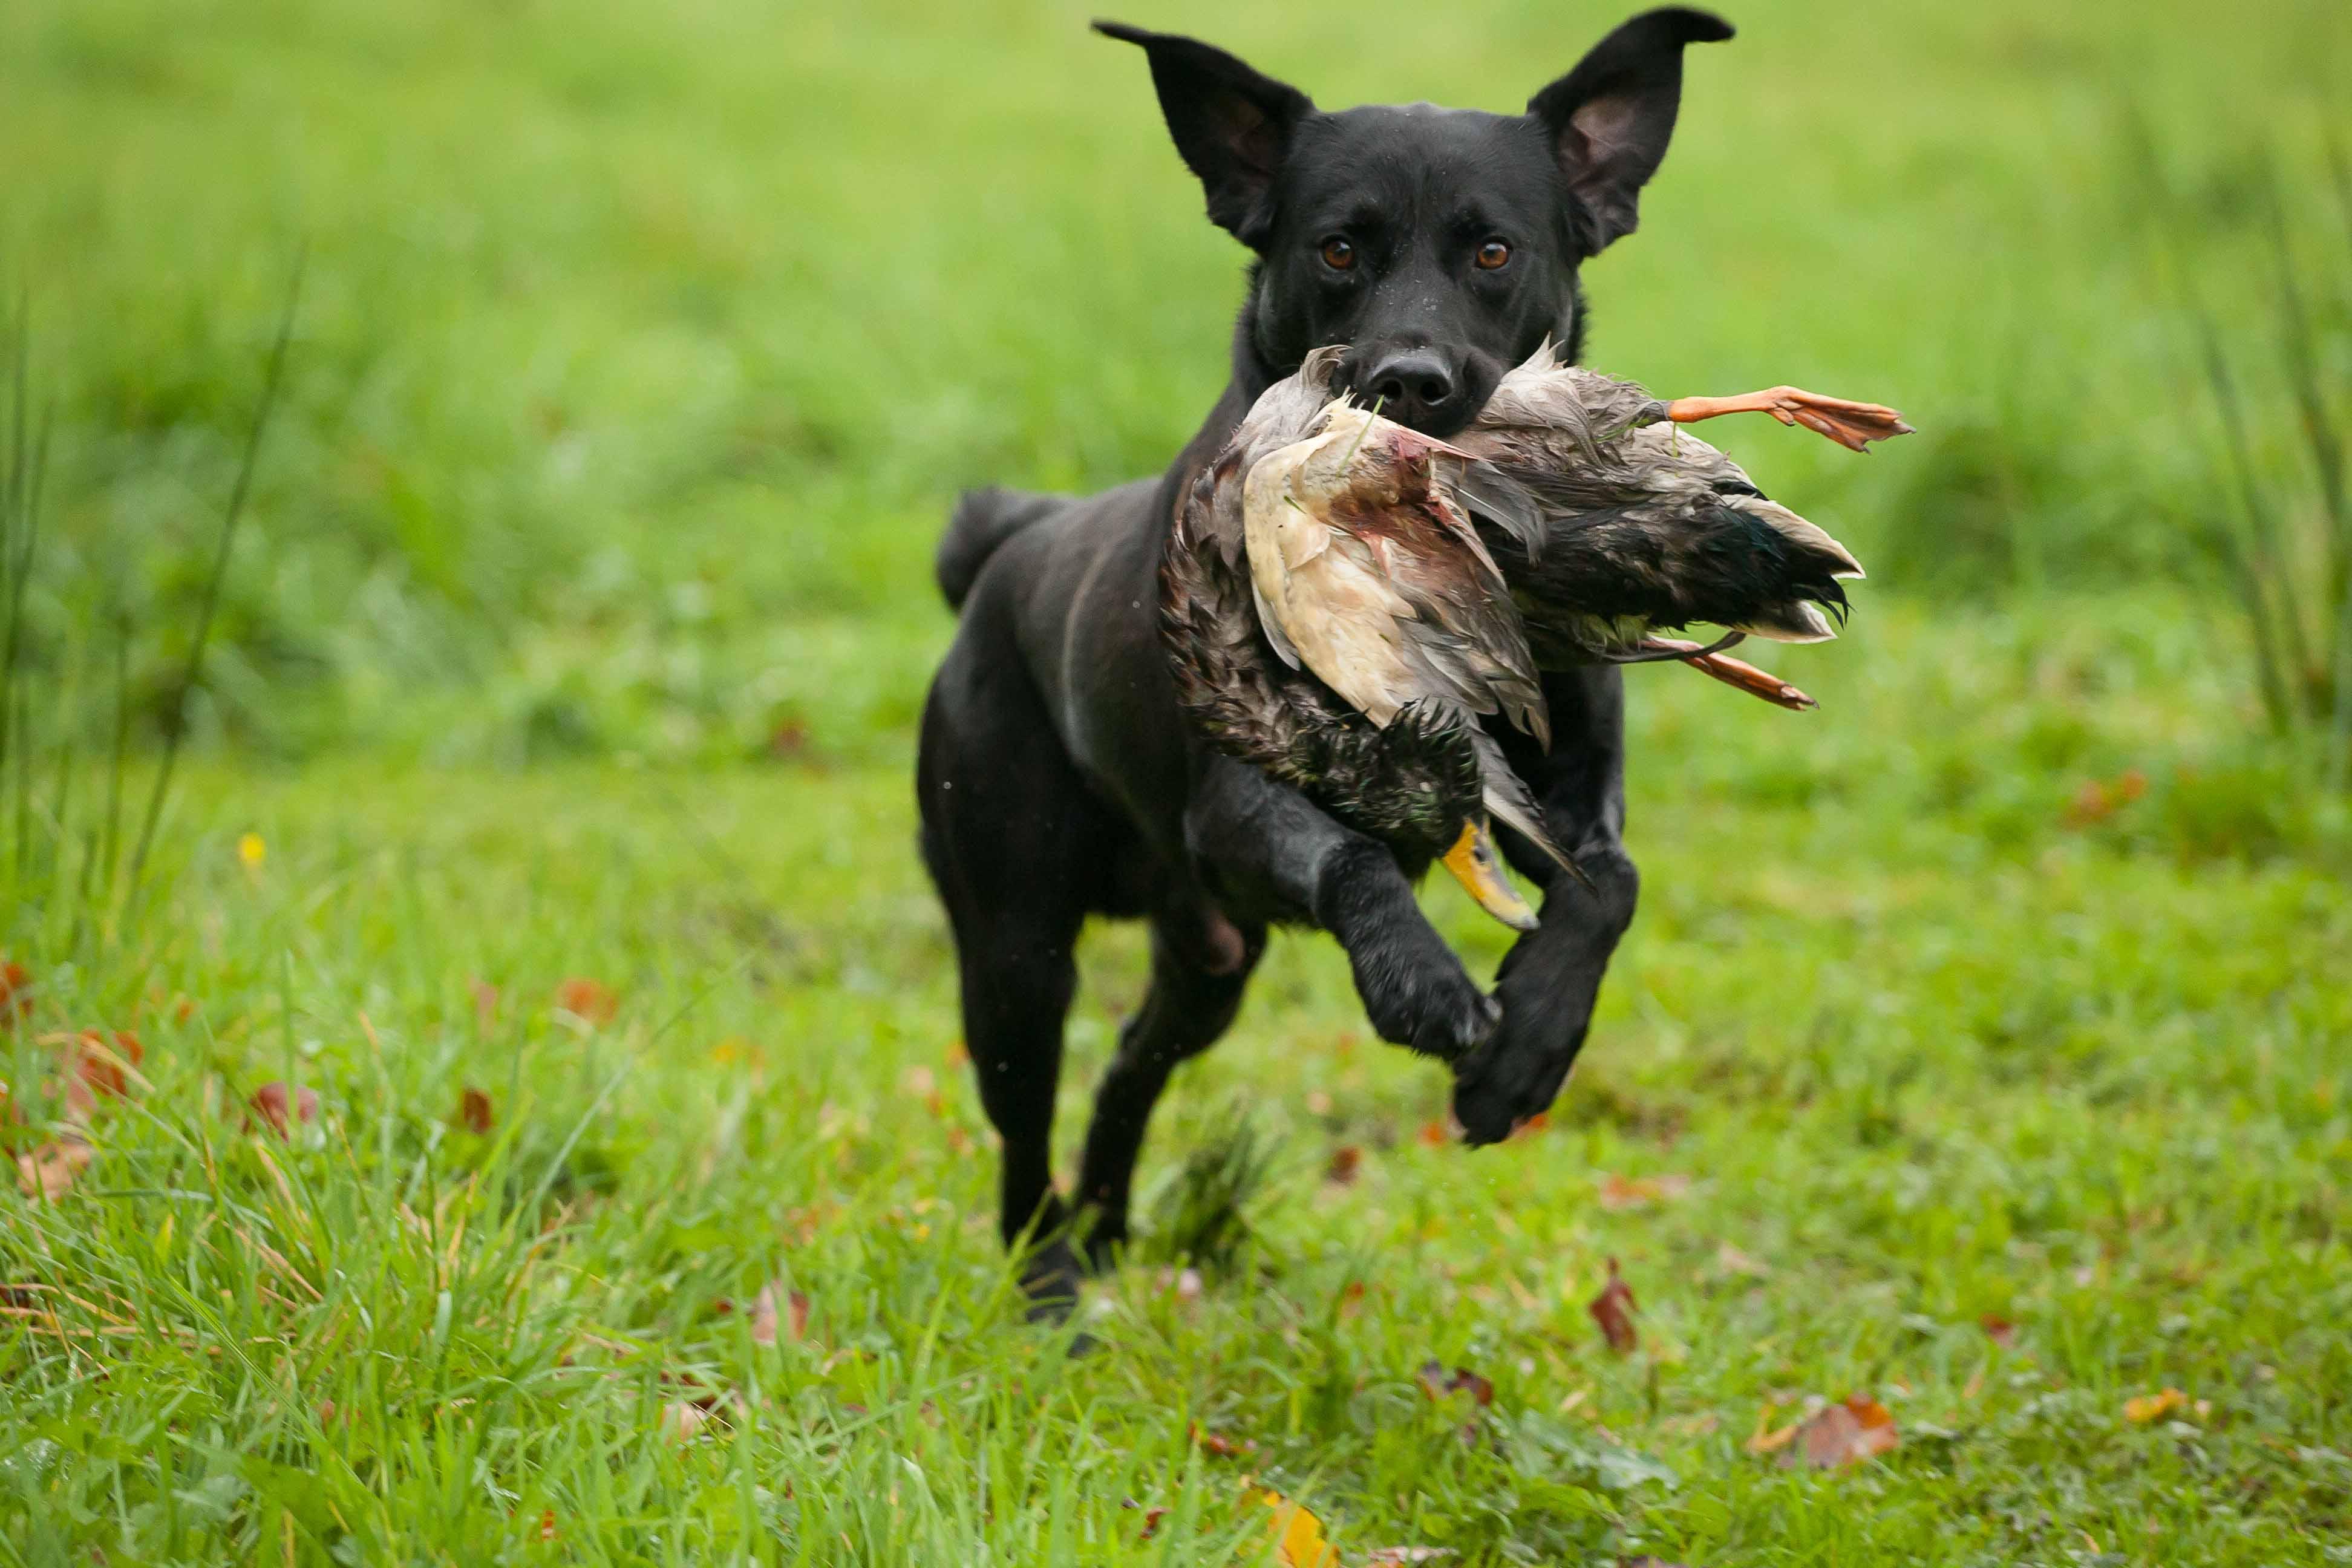 Black Labrador Gundog Black Labrador Came to me